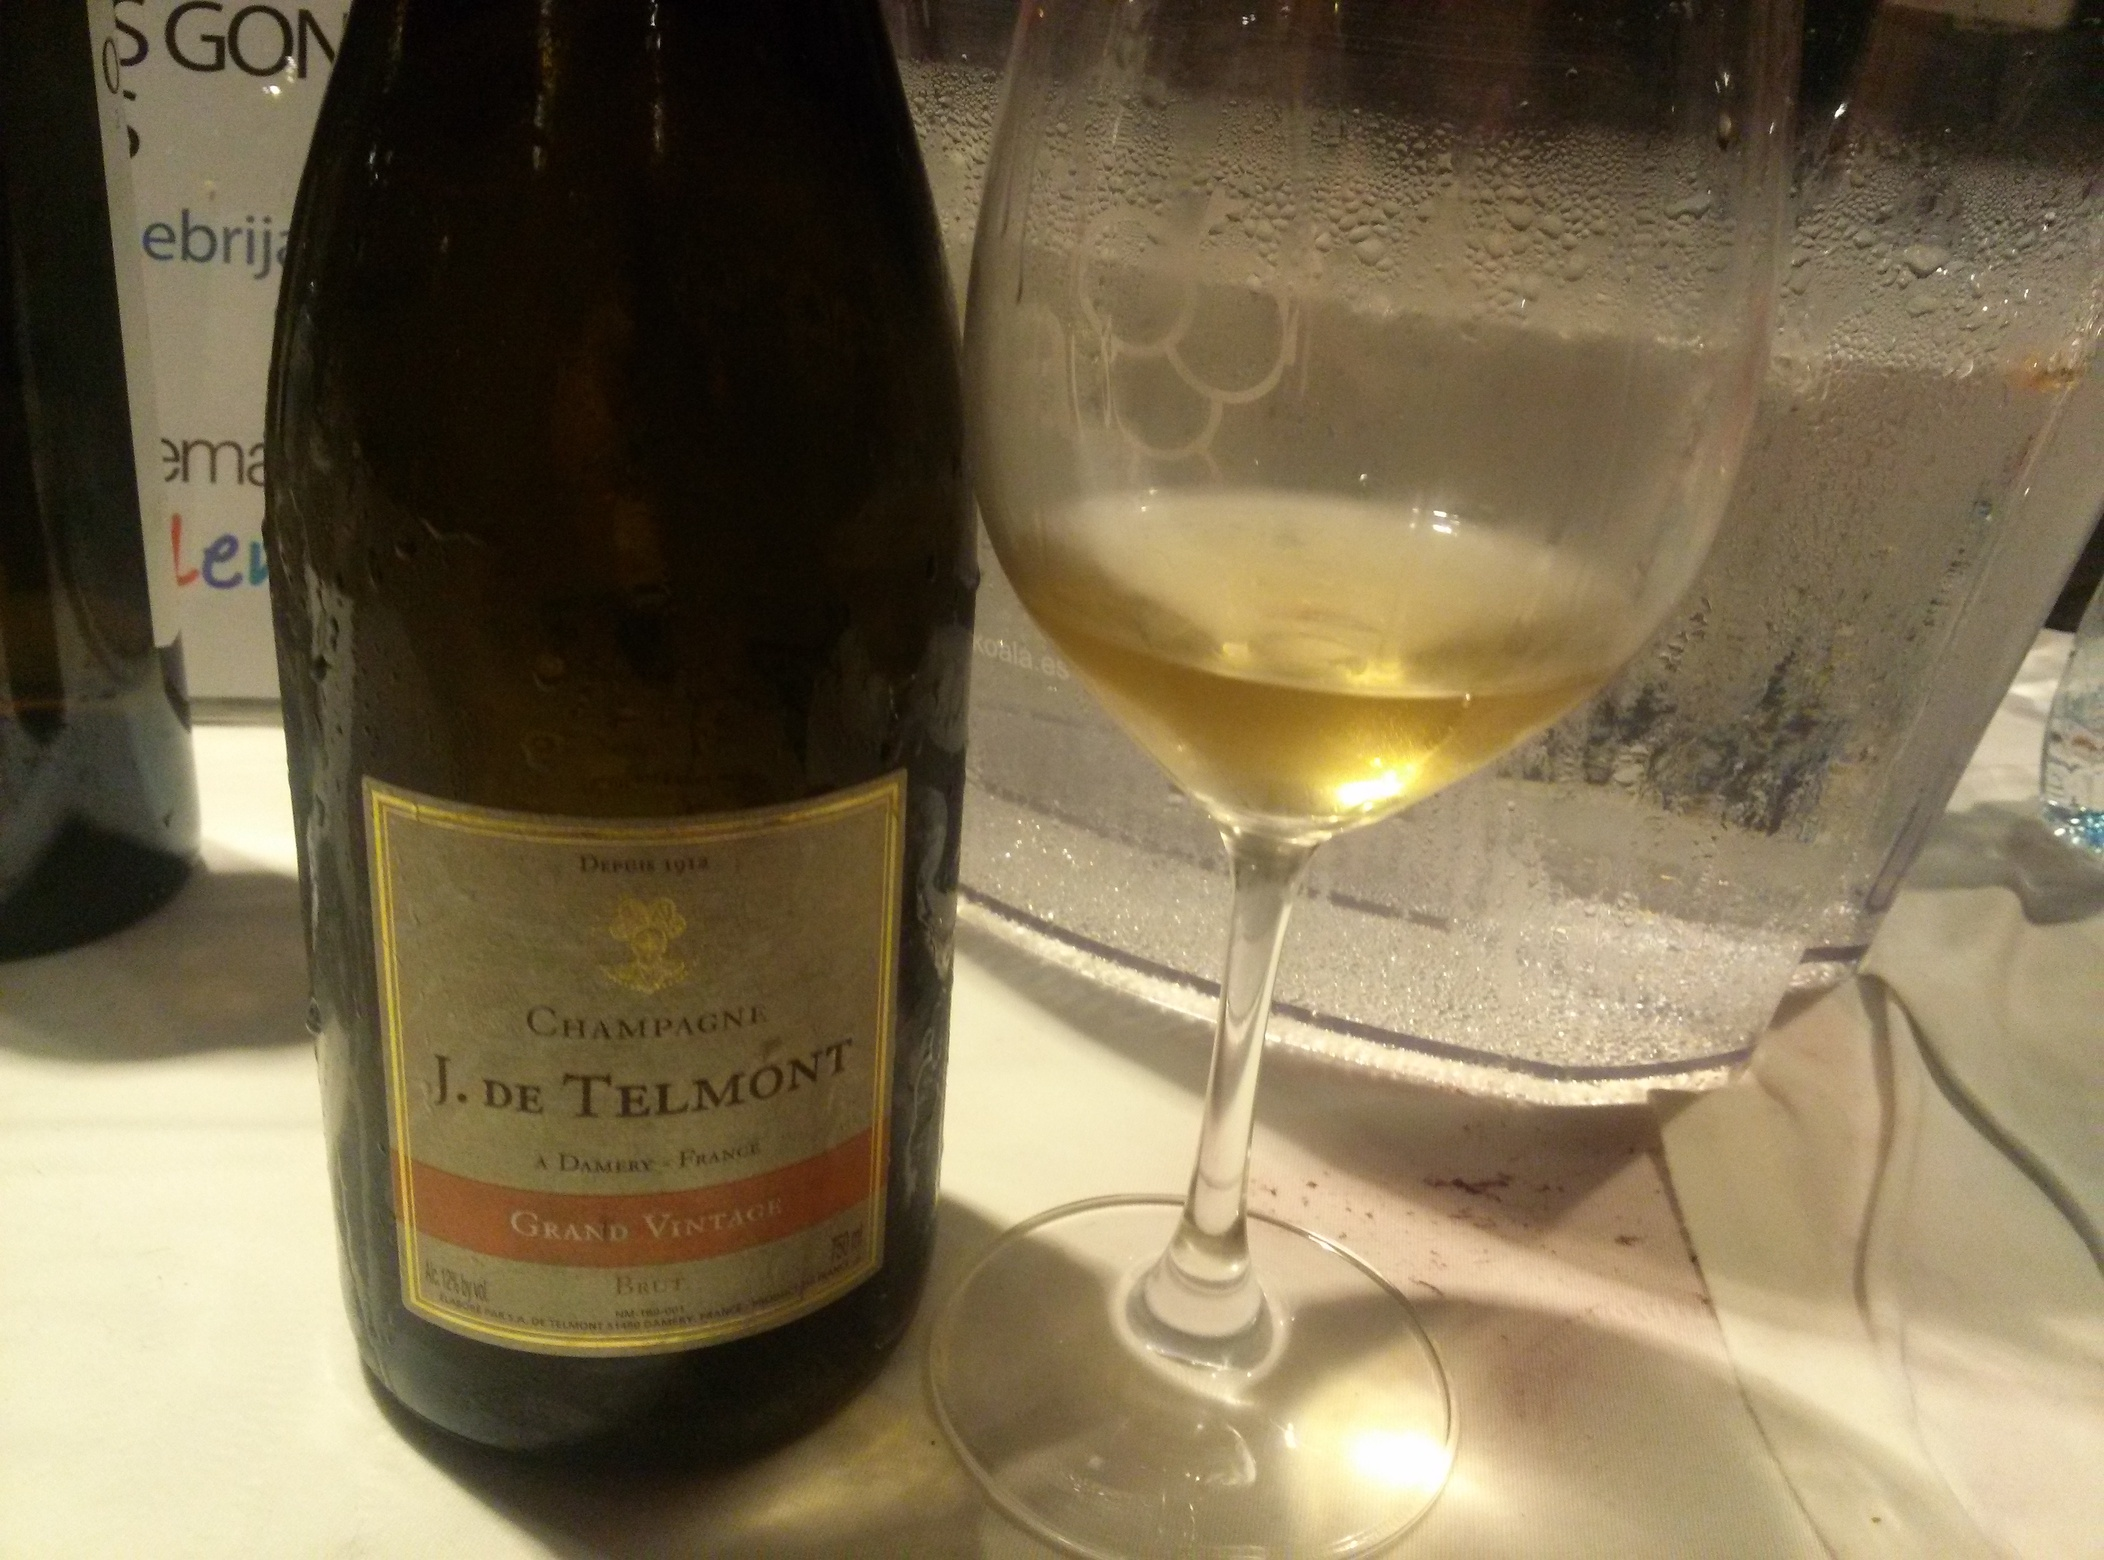 Champagne Telmont Grand Vintage